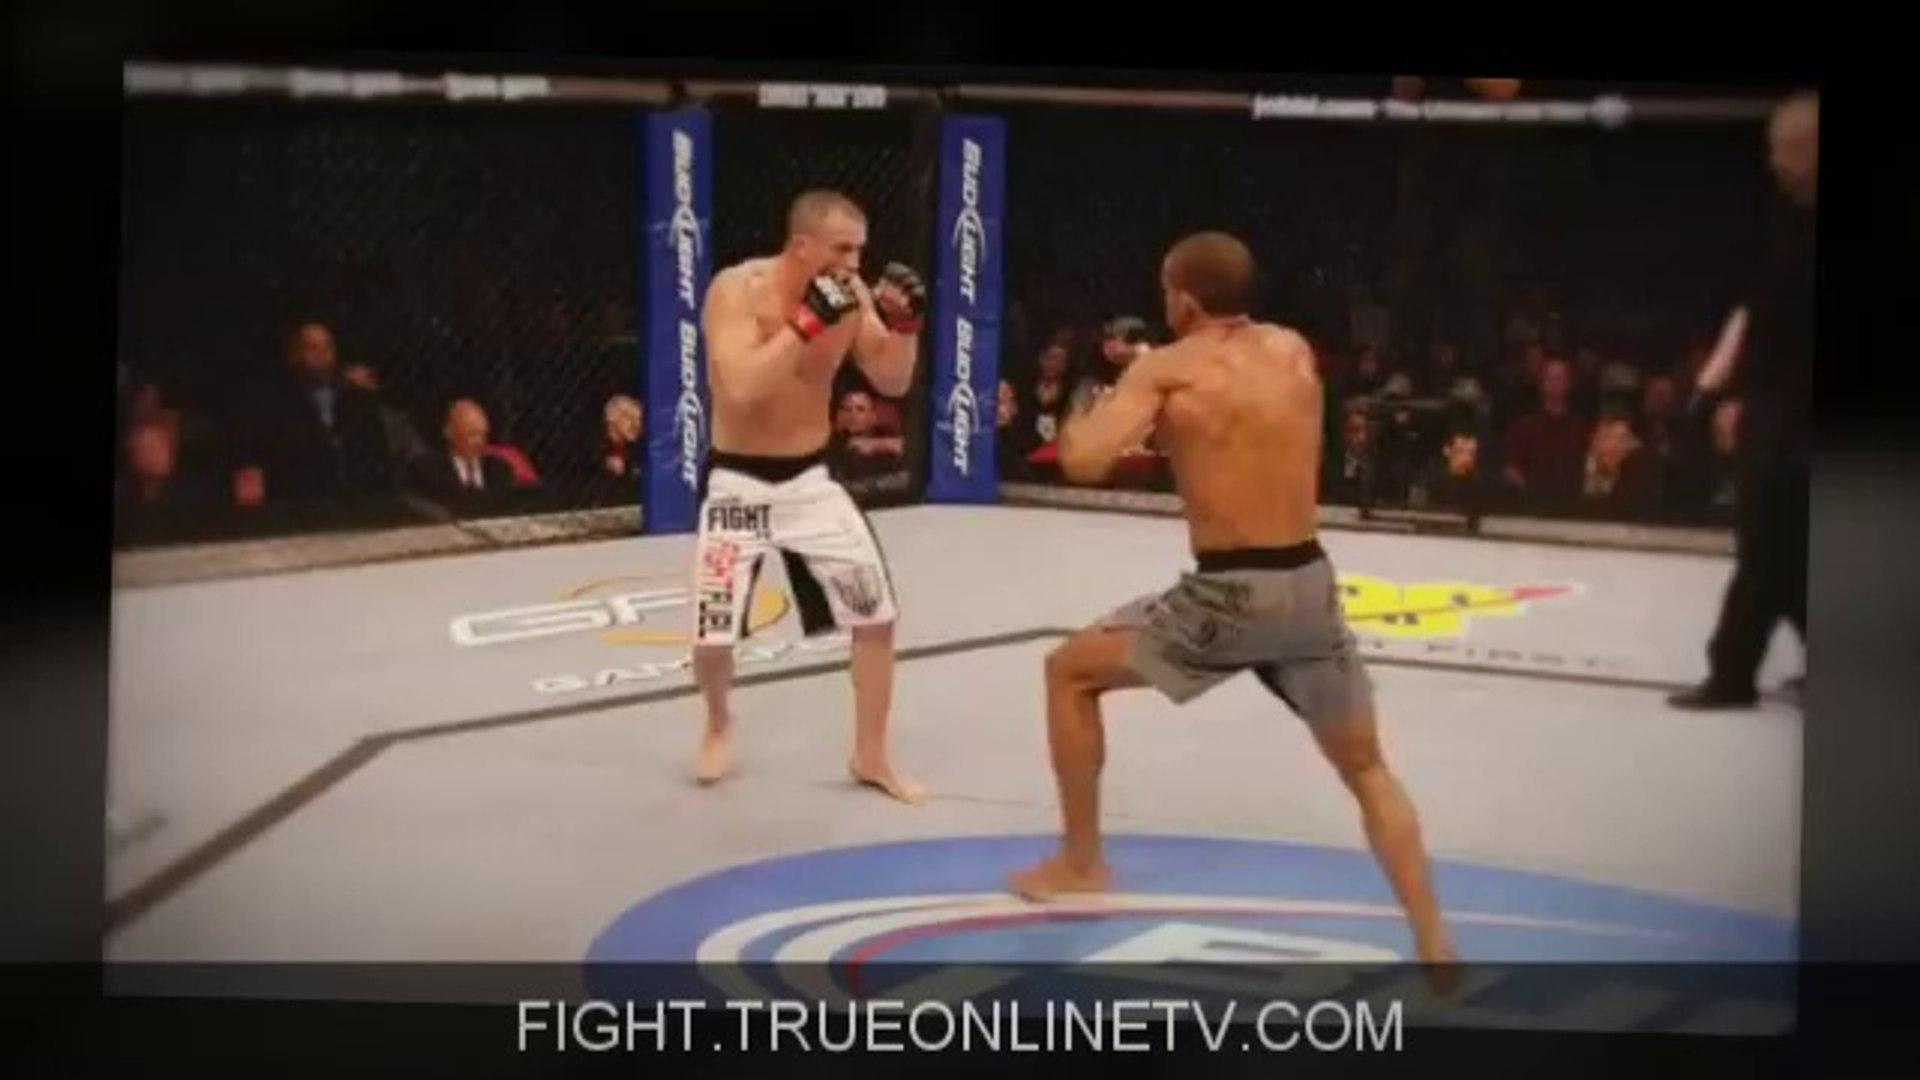 Watch Rafael Silva vs. Joe Warren - live BFC stream - mma online - mma live stream - mma live - mma